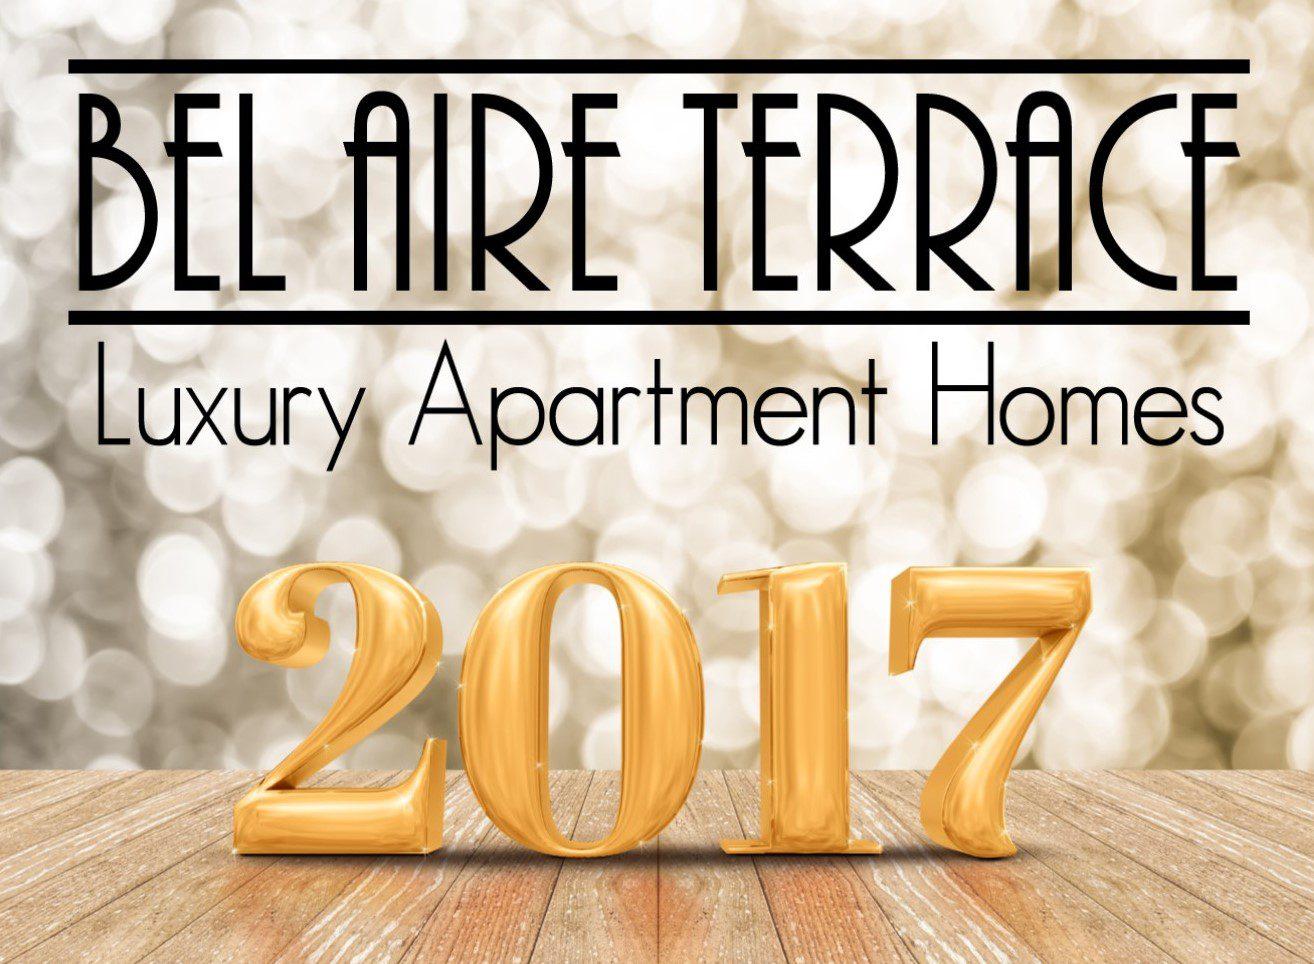 Bel Aire Terrace 2017 logo